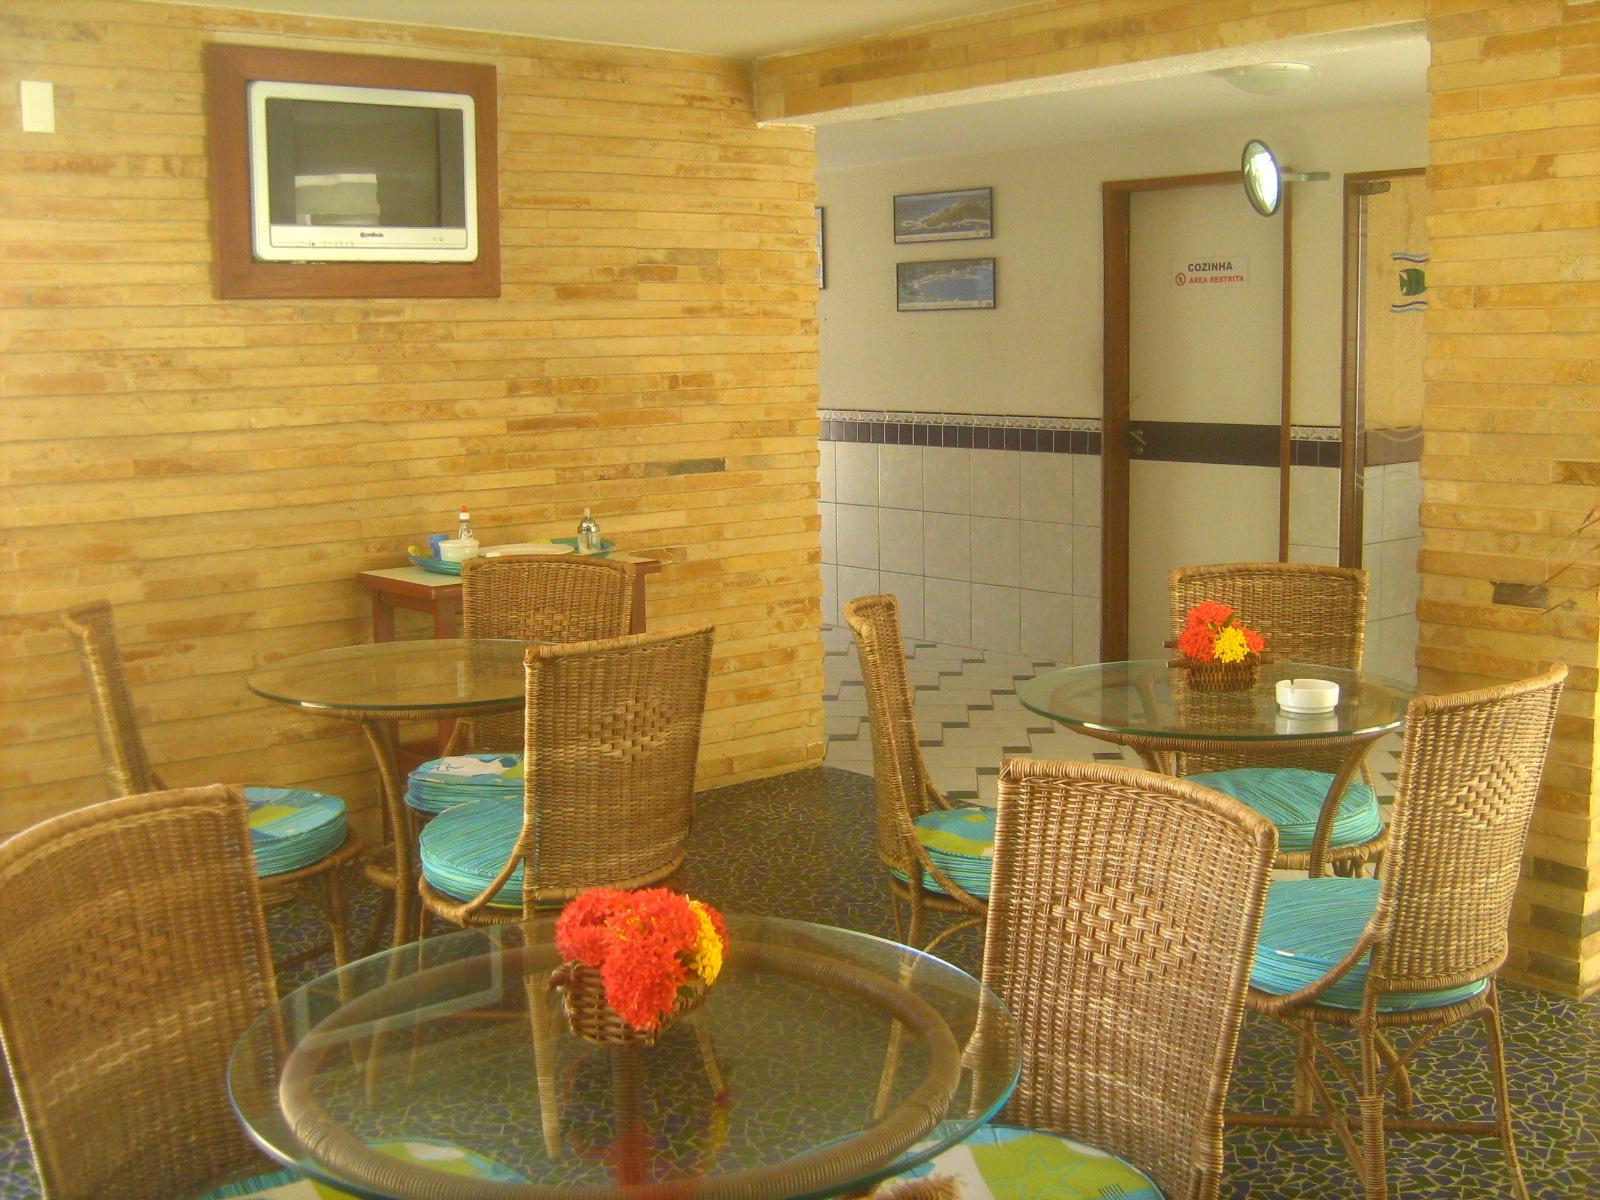 VIAJANTE ESPECIAL: Hotel Enseada dos Corais Cabo de Sto.Agostinho  #B73714 1600x1200 Banheiro Adaptado Deficiente Fisico